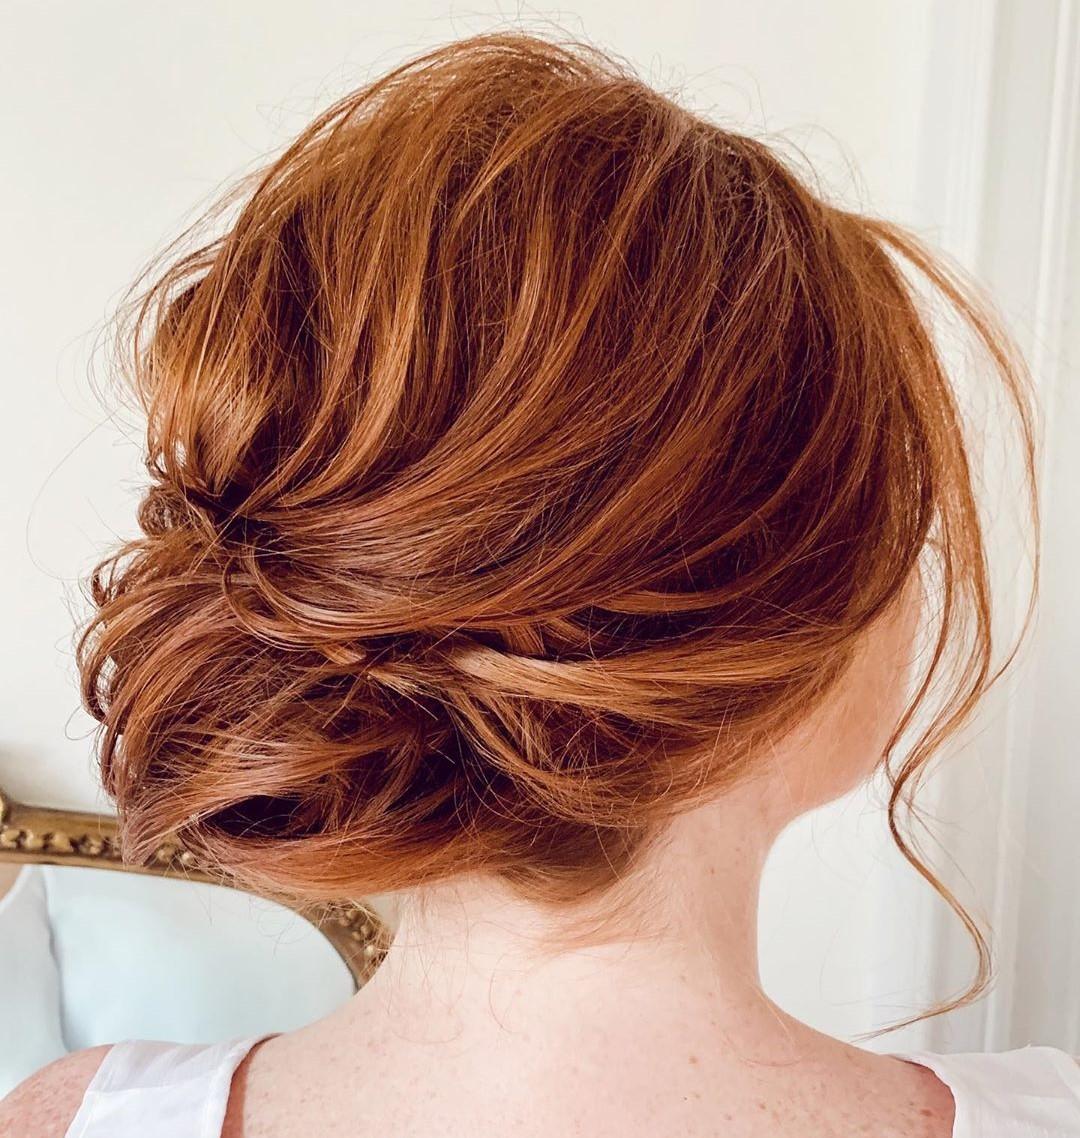 Messy Low Bum for Auburn Hair